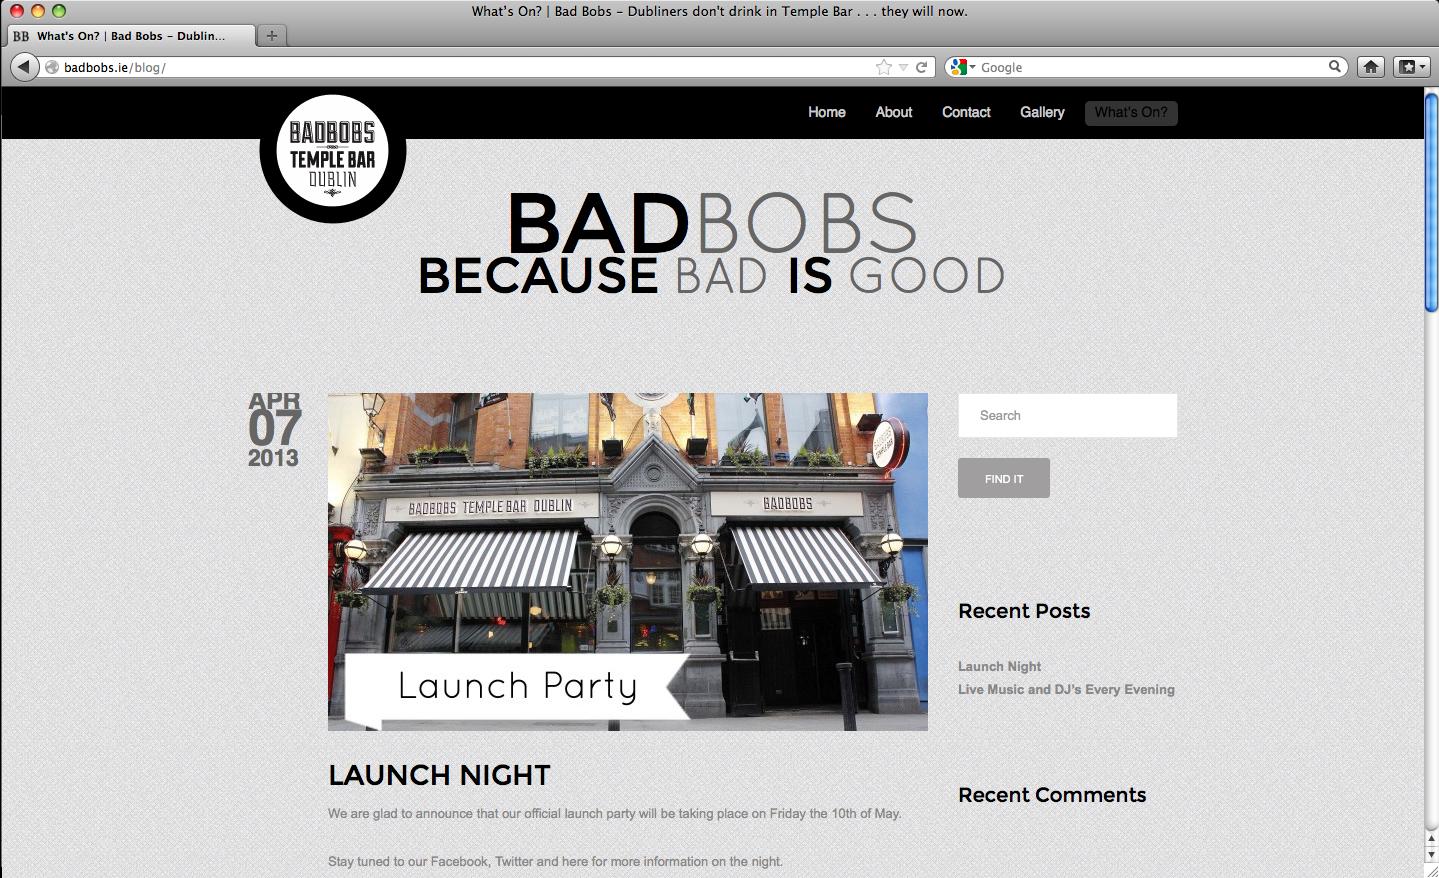 Blog Post: Launch Night